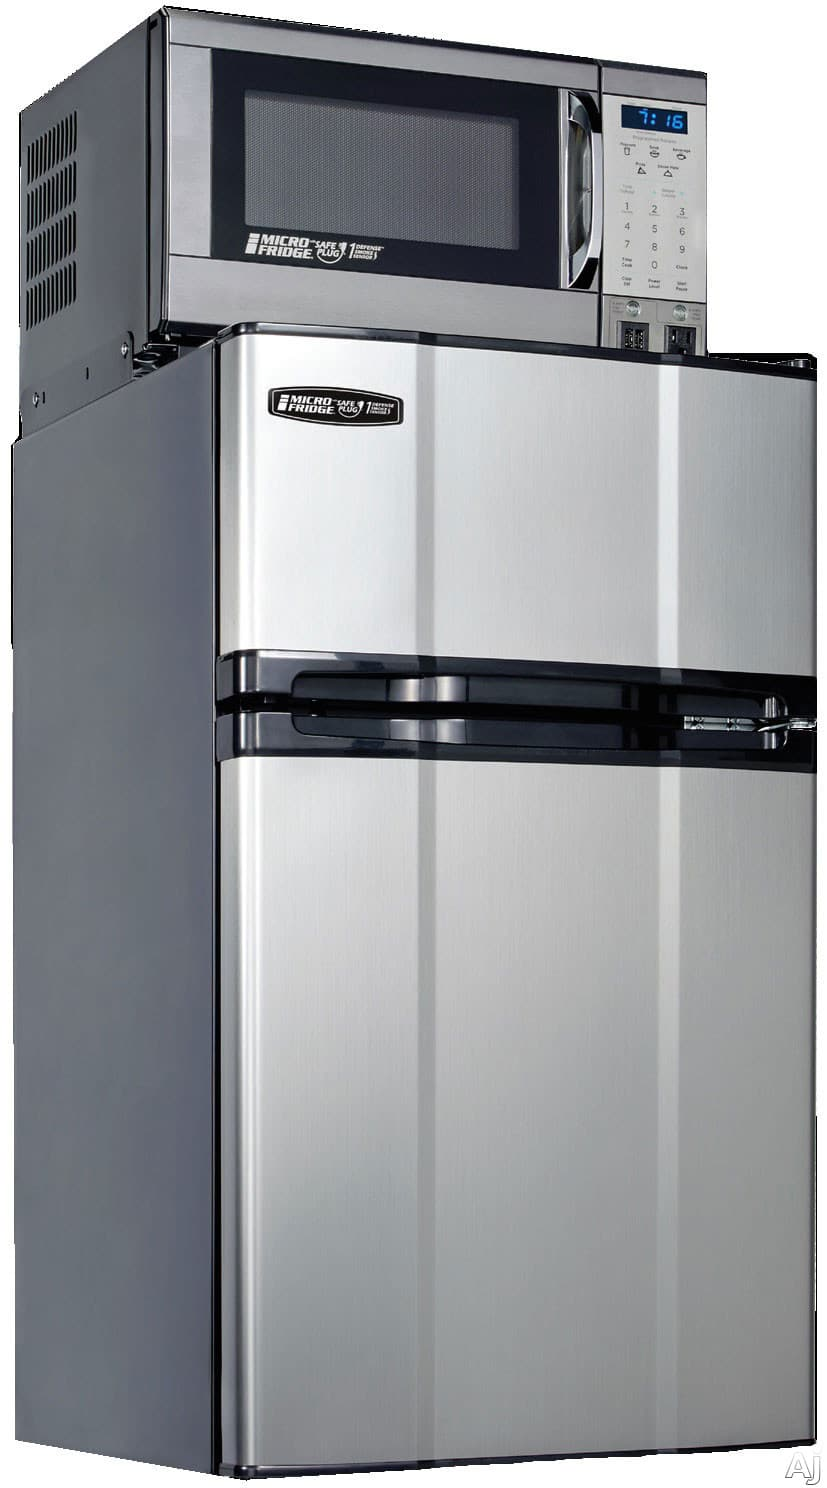 Microfridge 31mf7d1s 3 1 Cu Ft Compact Refrigerator With